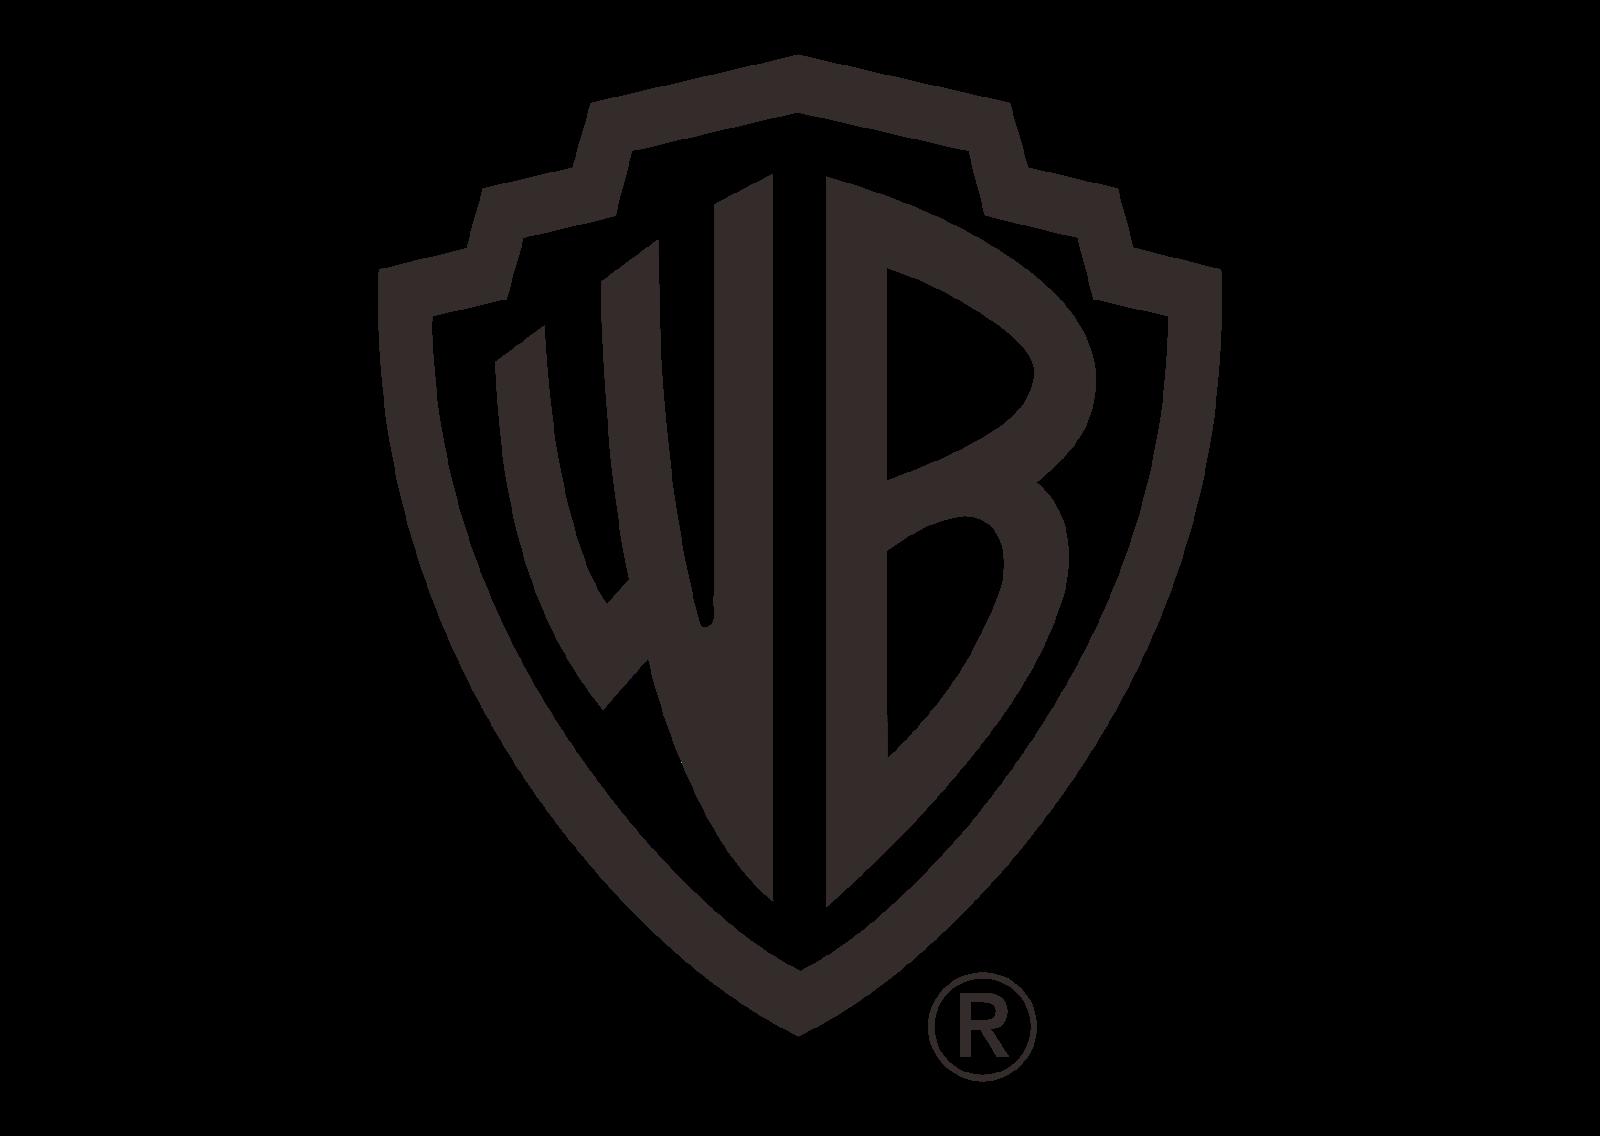 WarnerBrosvectorlogopng Pixels Wunderball Logo - Car sign with namescharming logos and their companieson best buy logo with logos